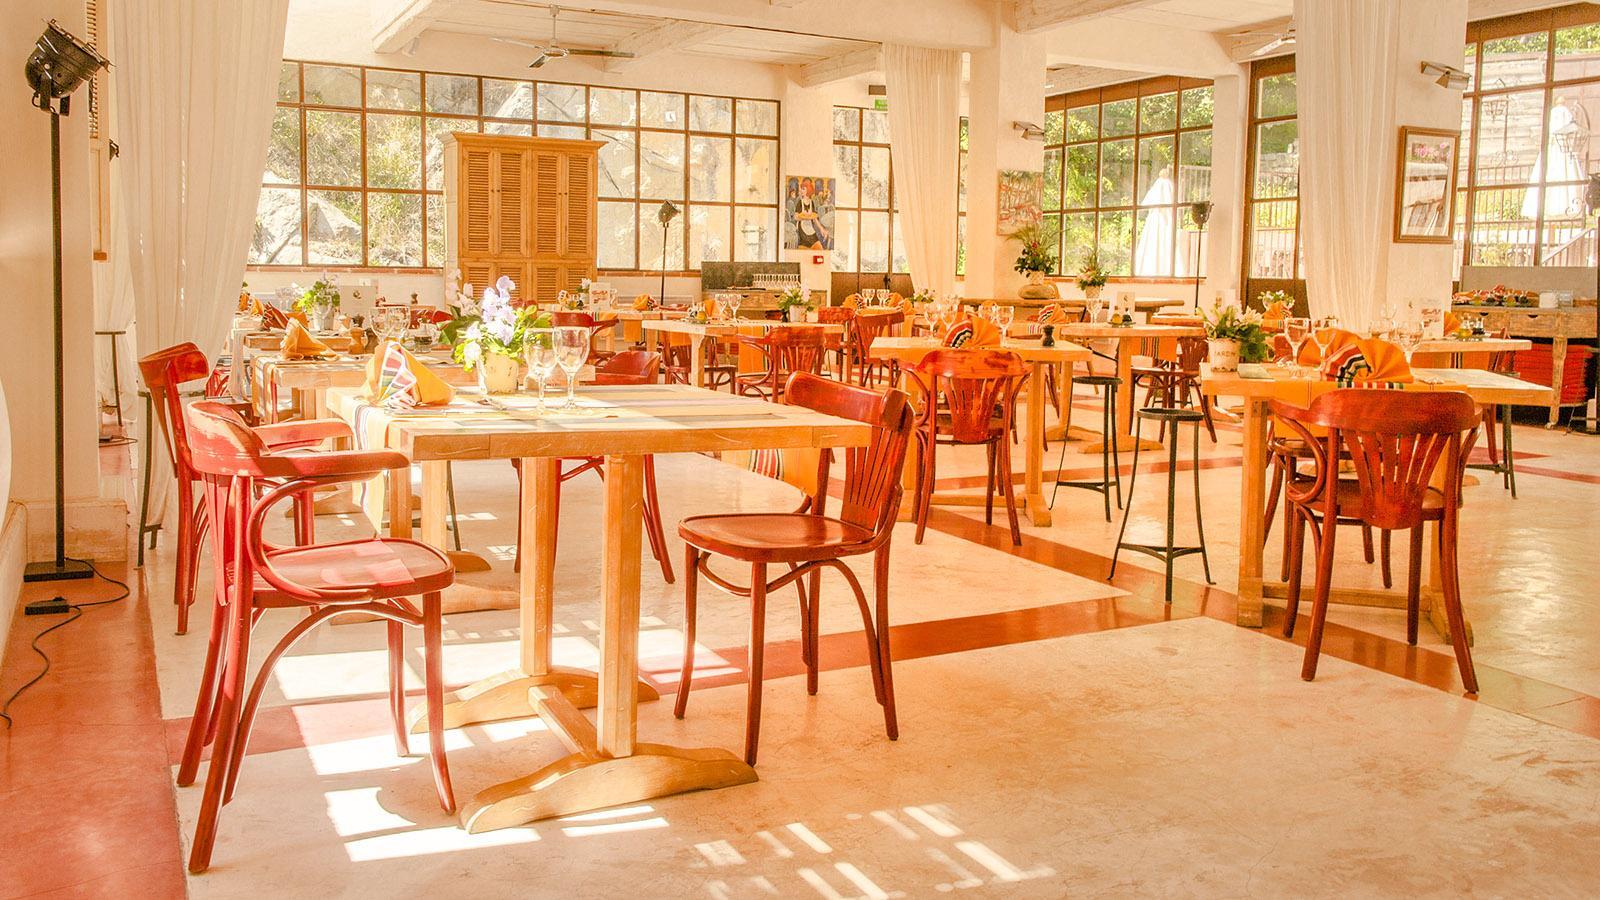 Der Speisesaal des Grand Hotels von Molitg-les-Bains. Foto: Hilke Maunder